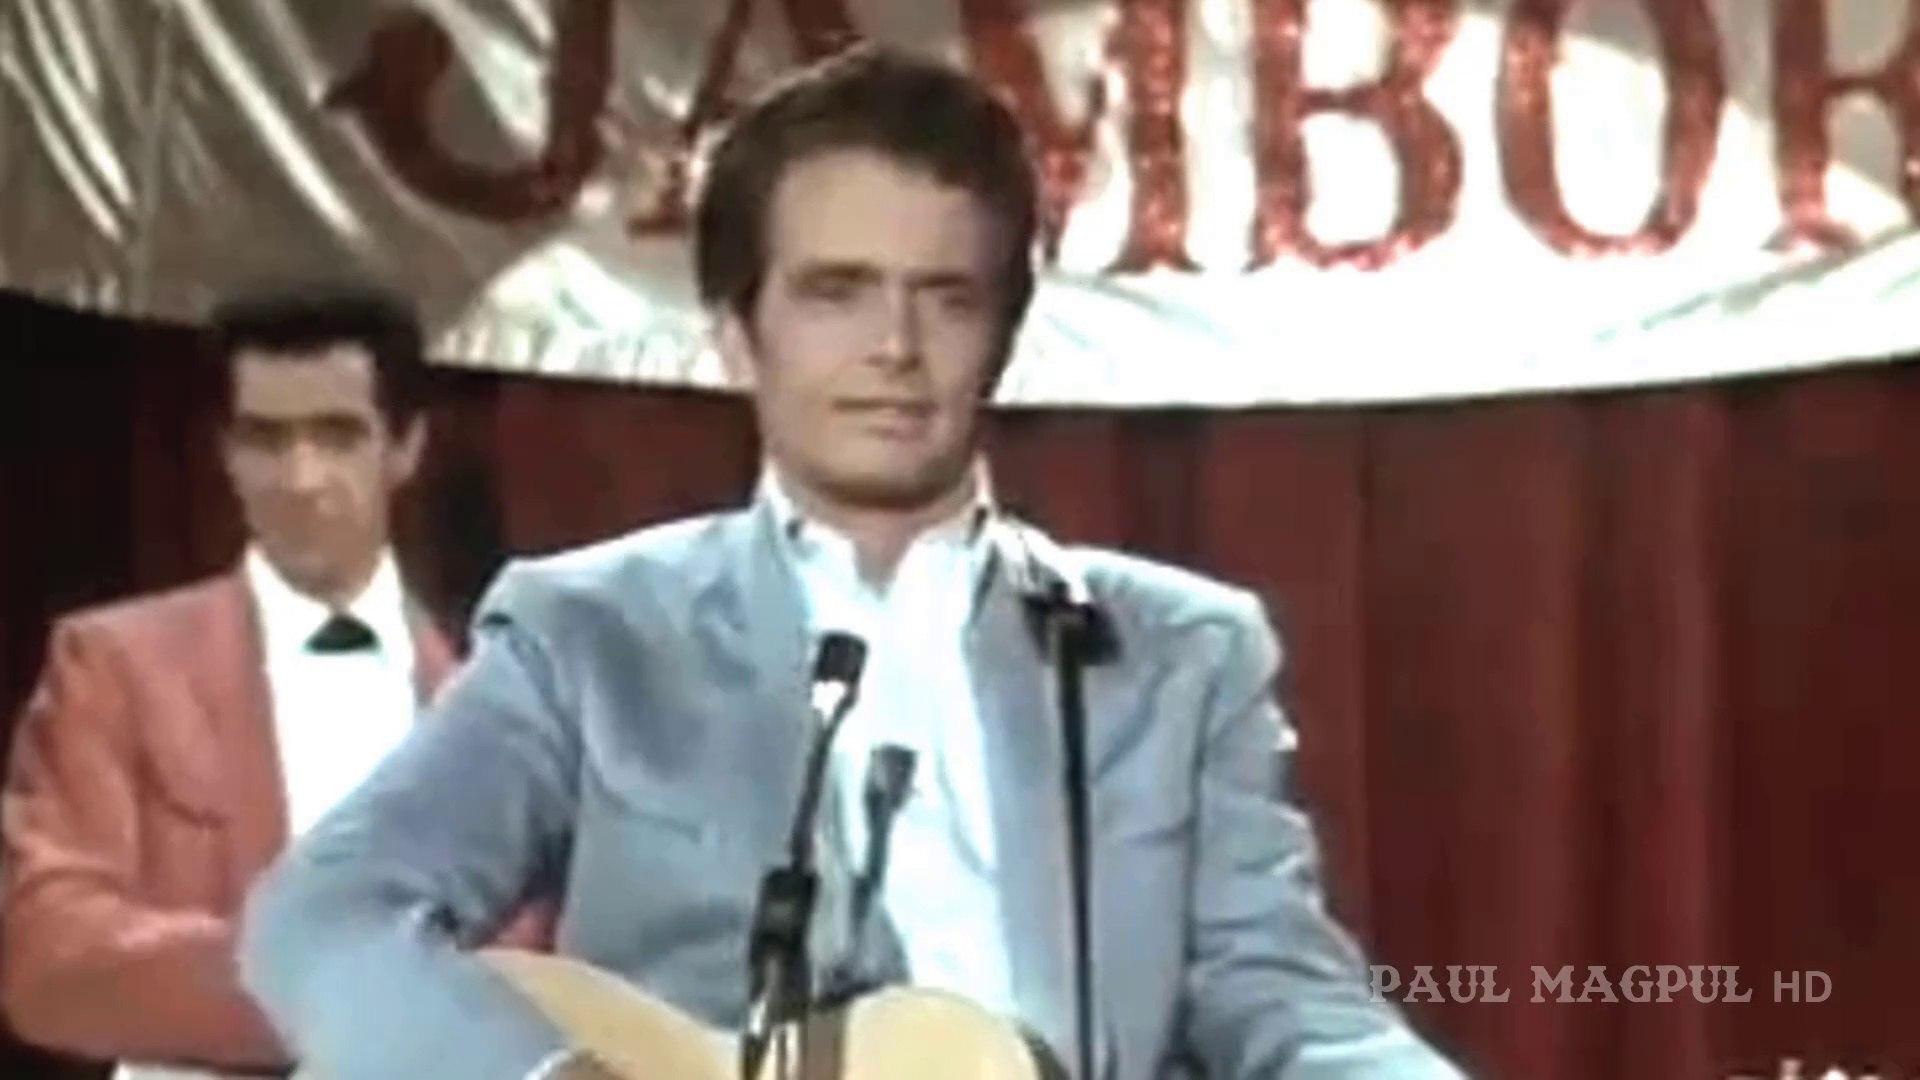 Merle Haggard (HD) - Greatest Hits (1966-1989) - Part 1/2